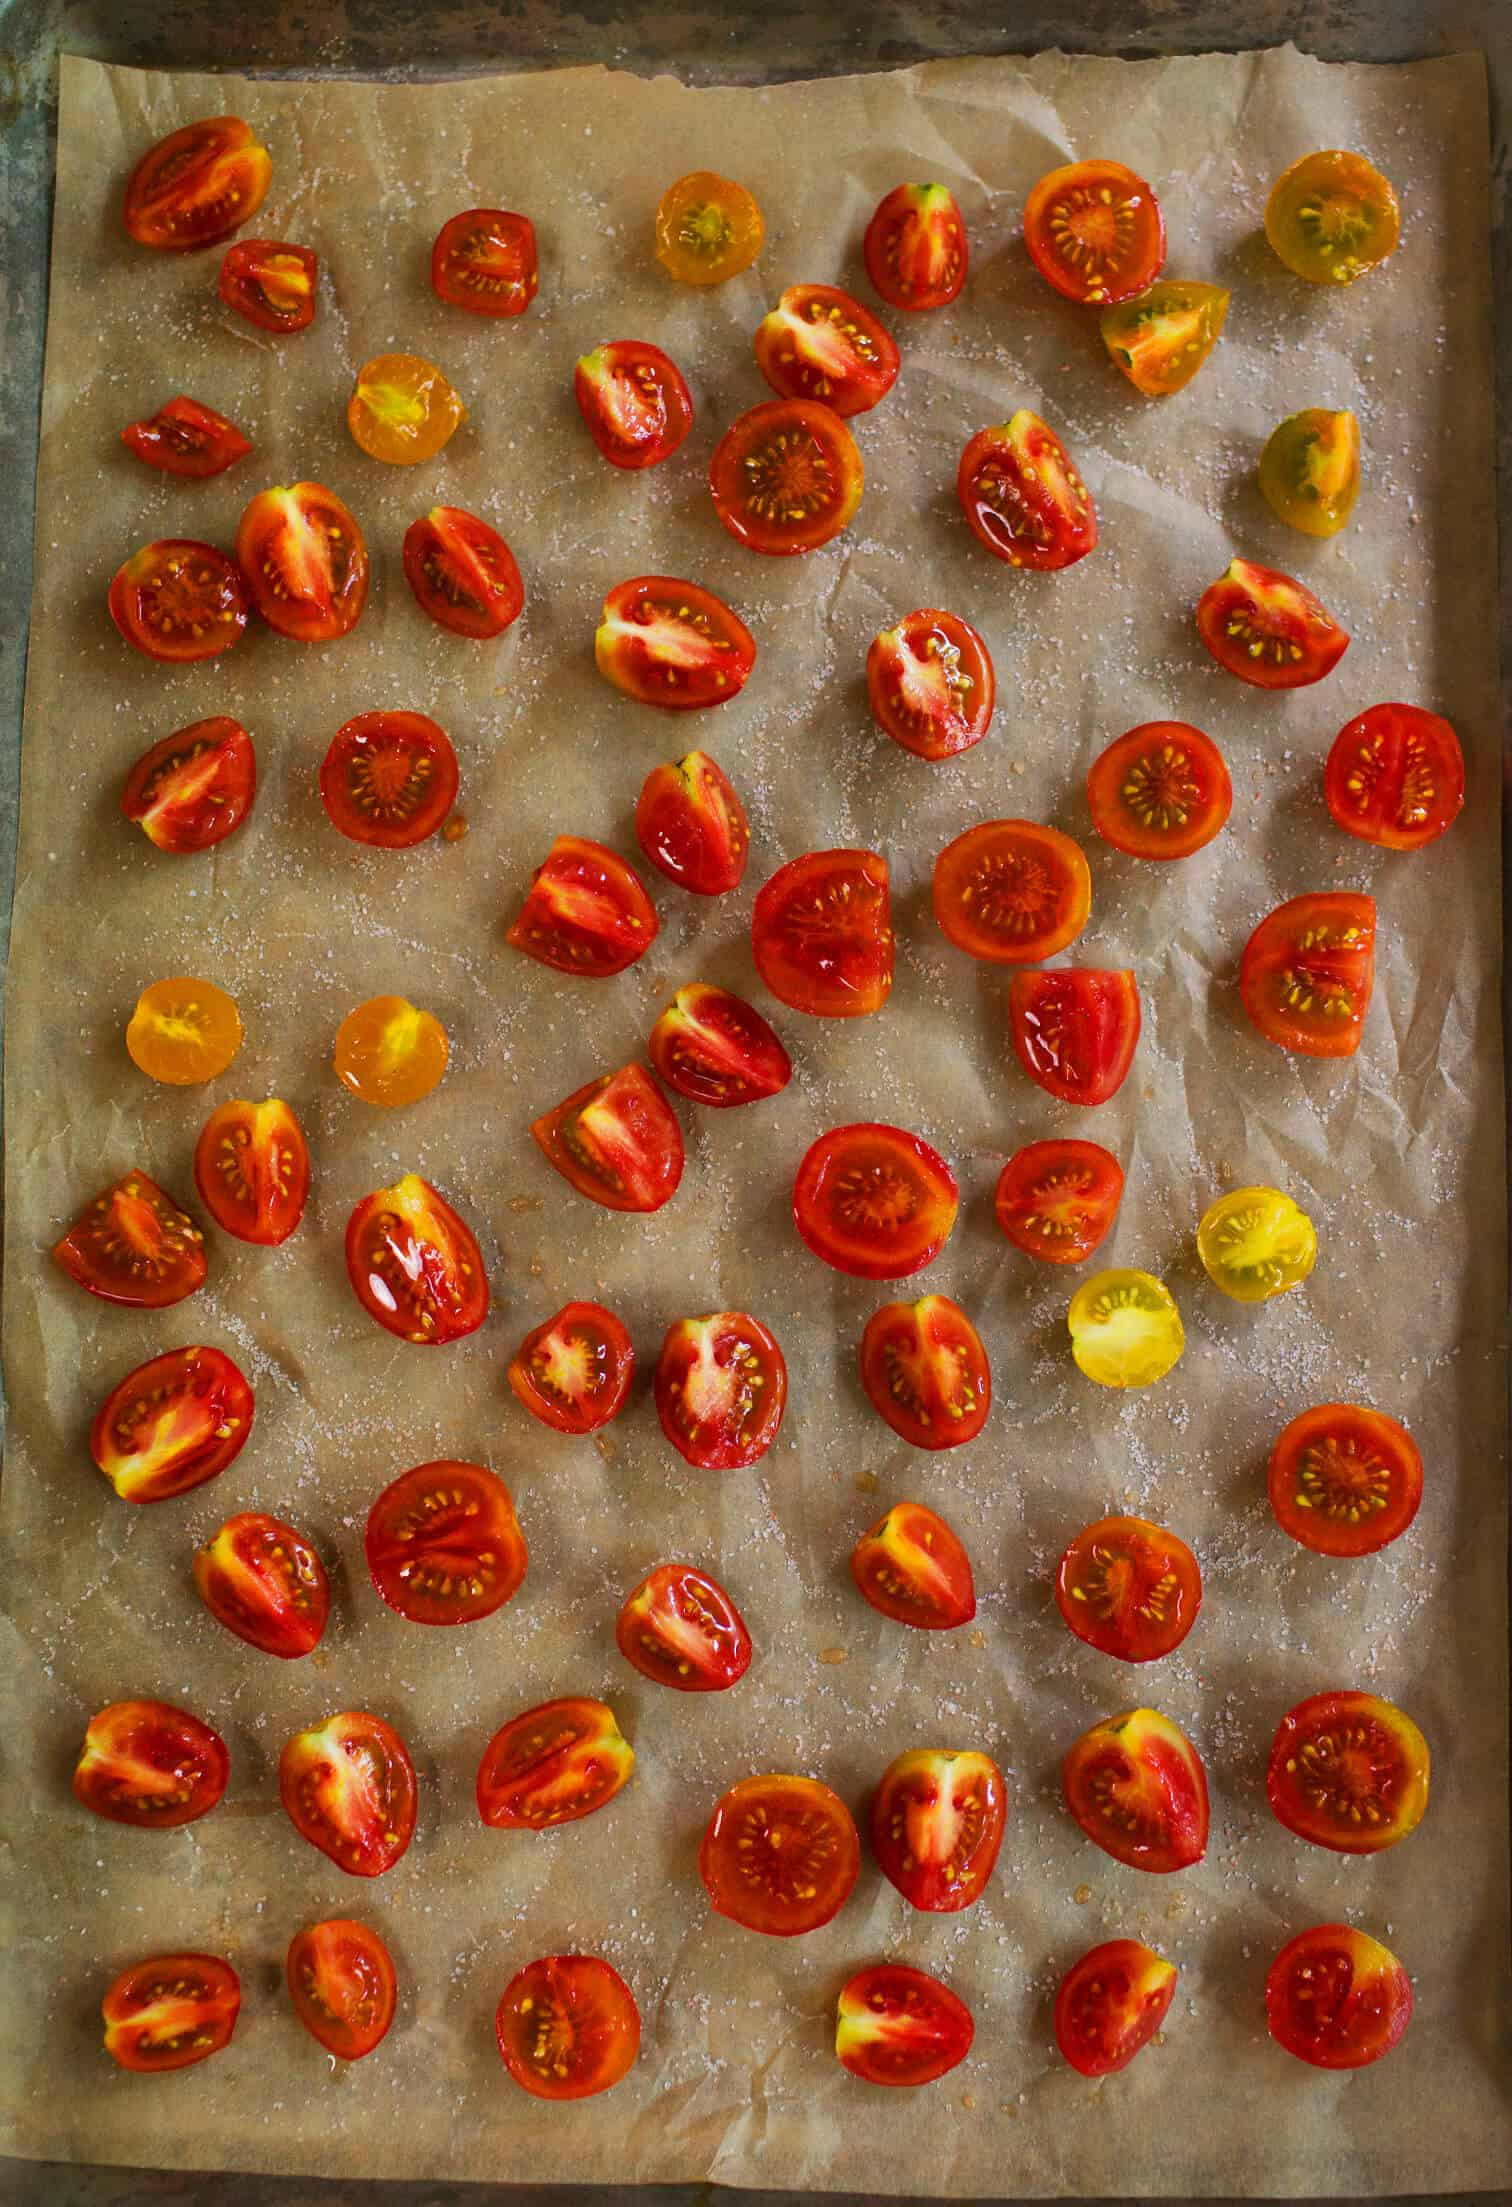 Ofen gebratene Tomaten-, Basilikum- und Mozzarella-Quiche